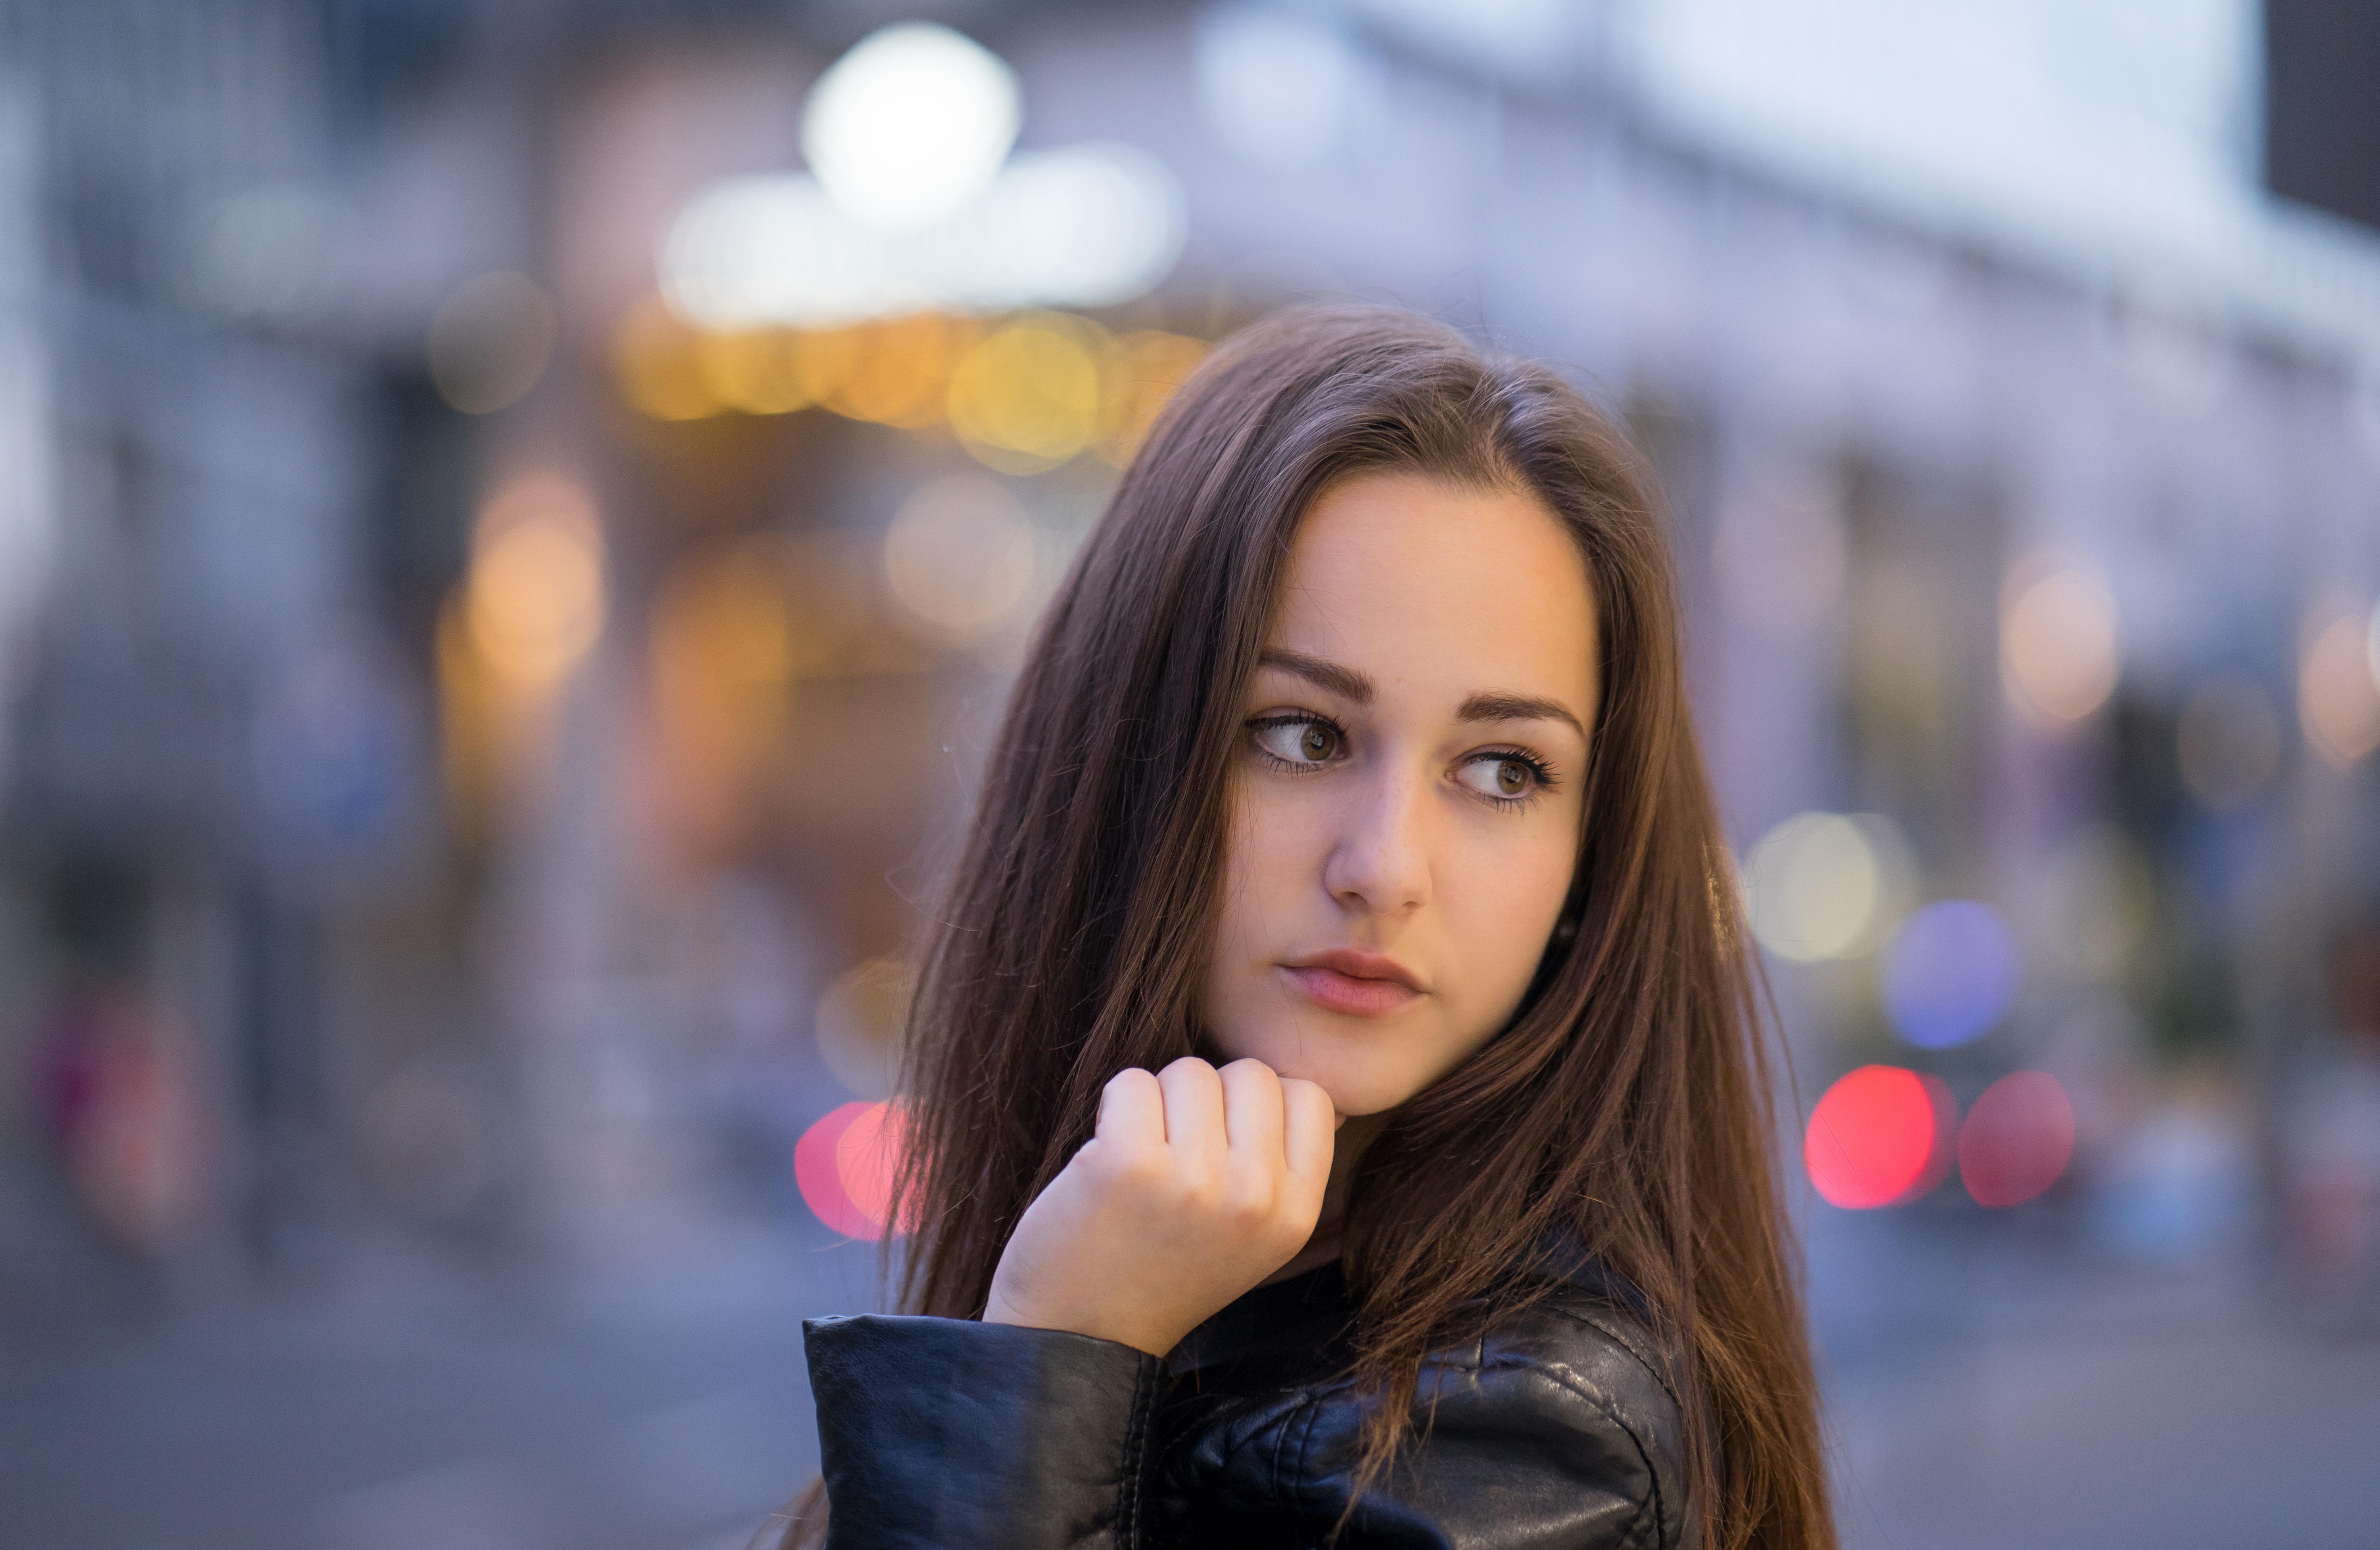 beauty portrait 1575665098 - Beauty Portrait -